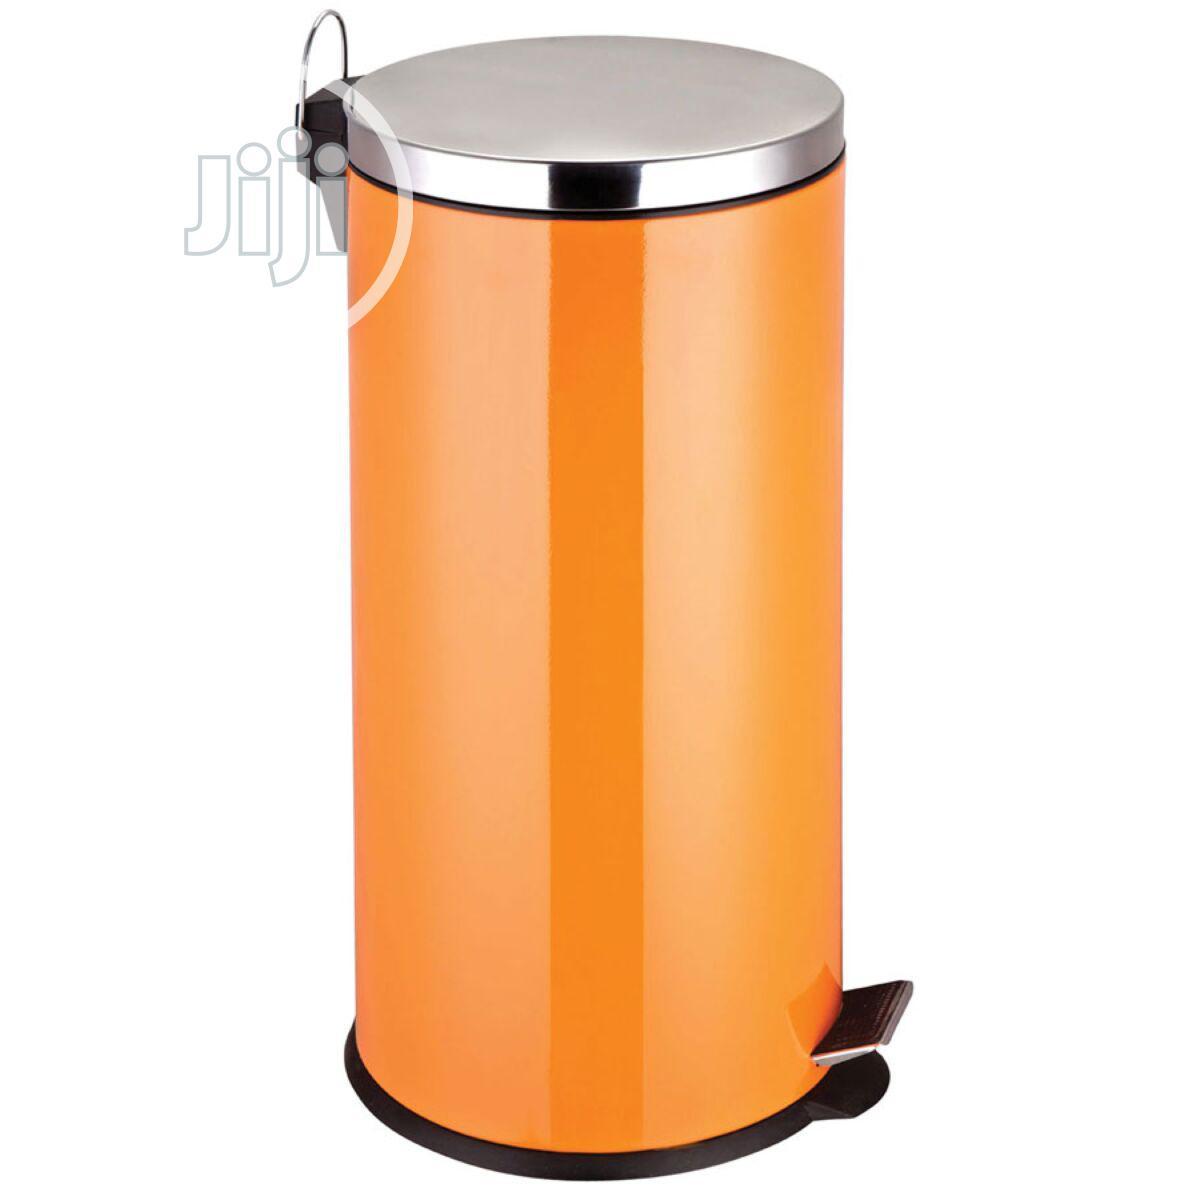 Premier Housewares 30L Stainless Steel Pedal Bin - Orange